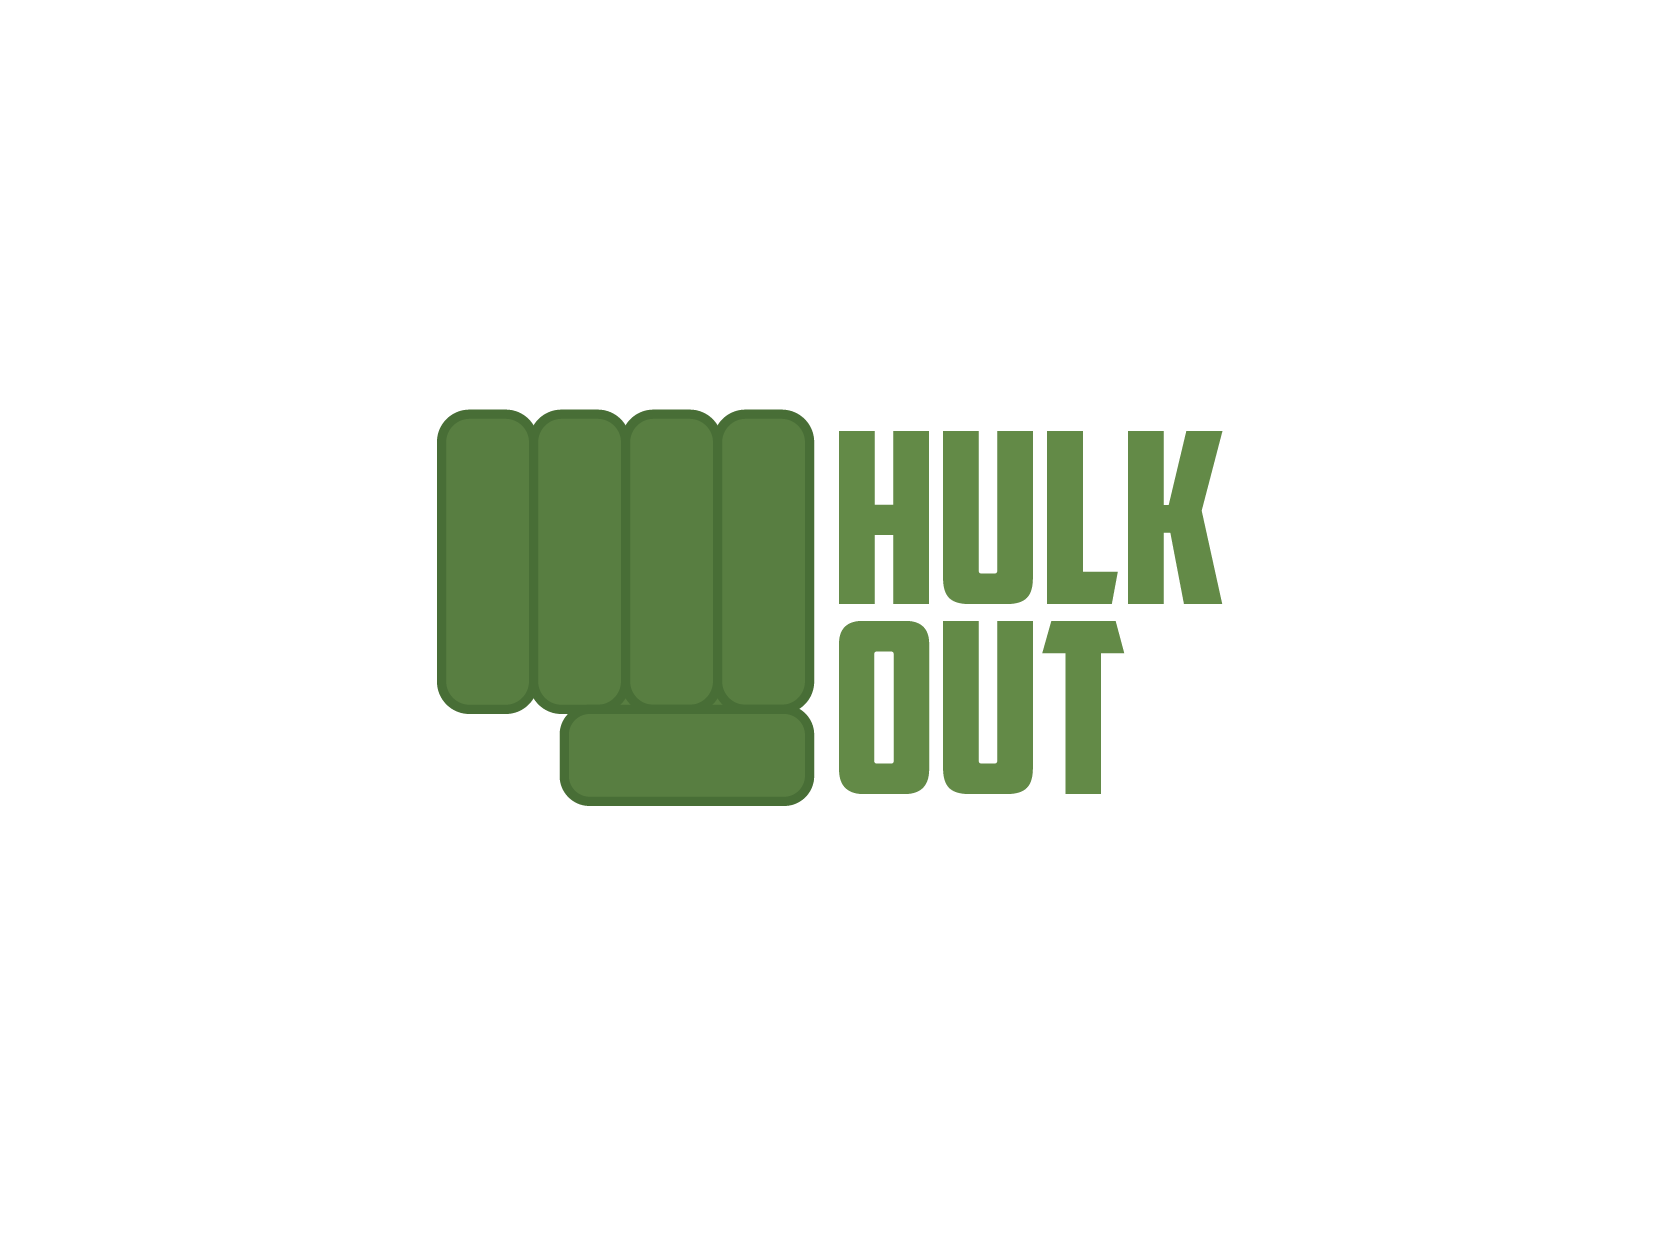 hulkoutlogo-01.png